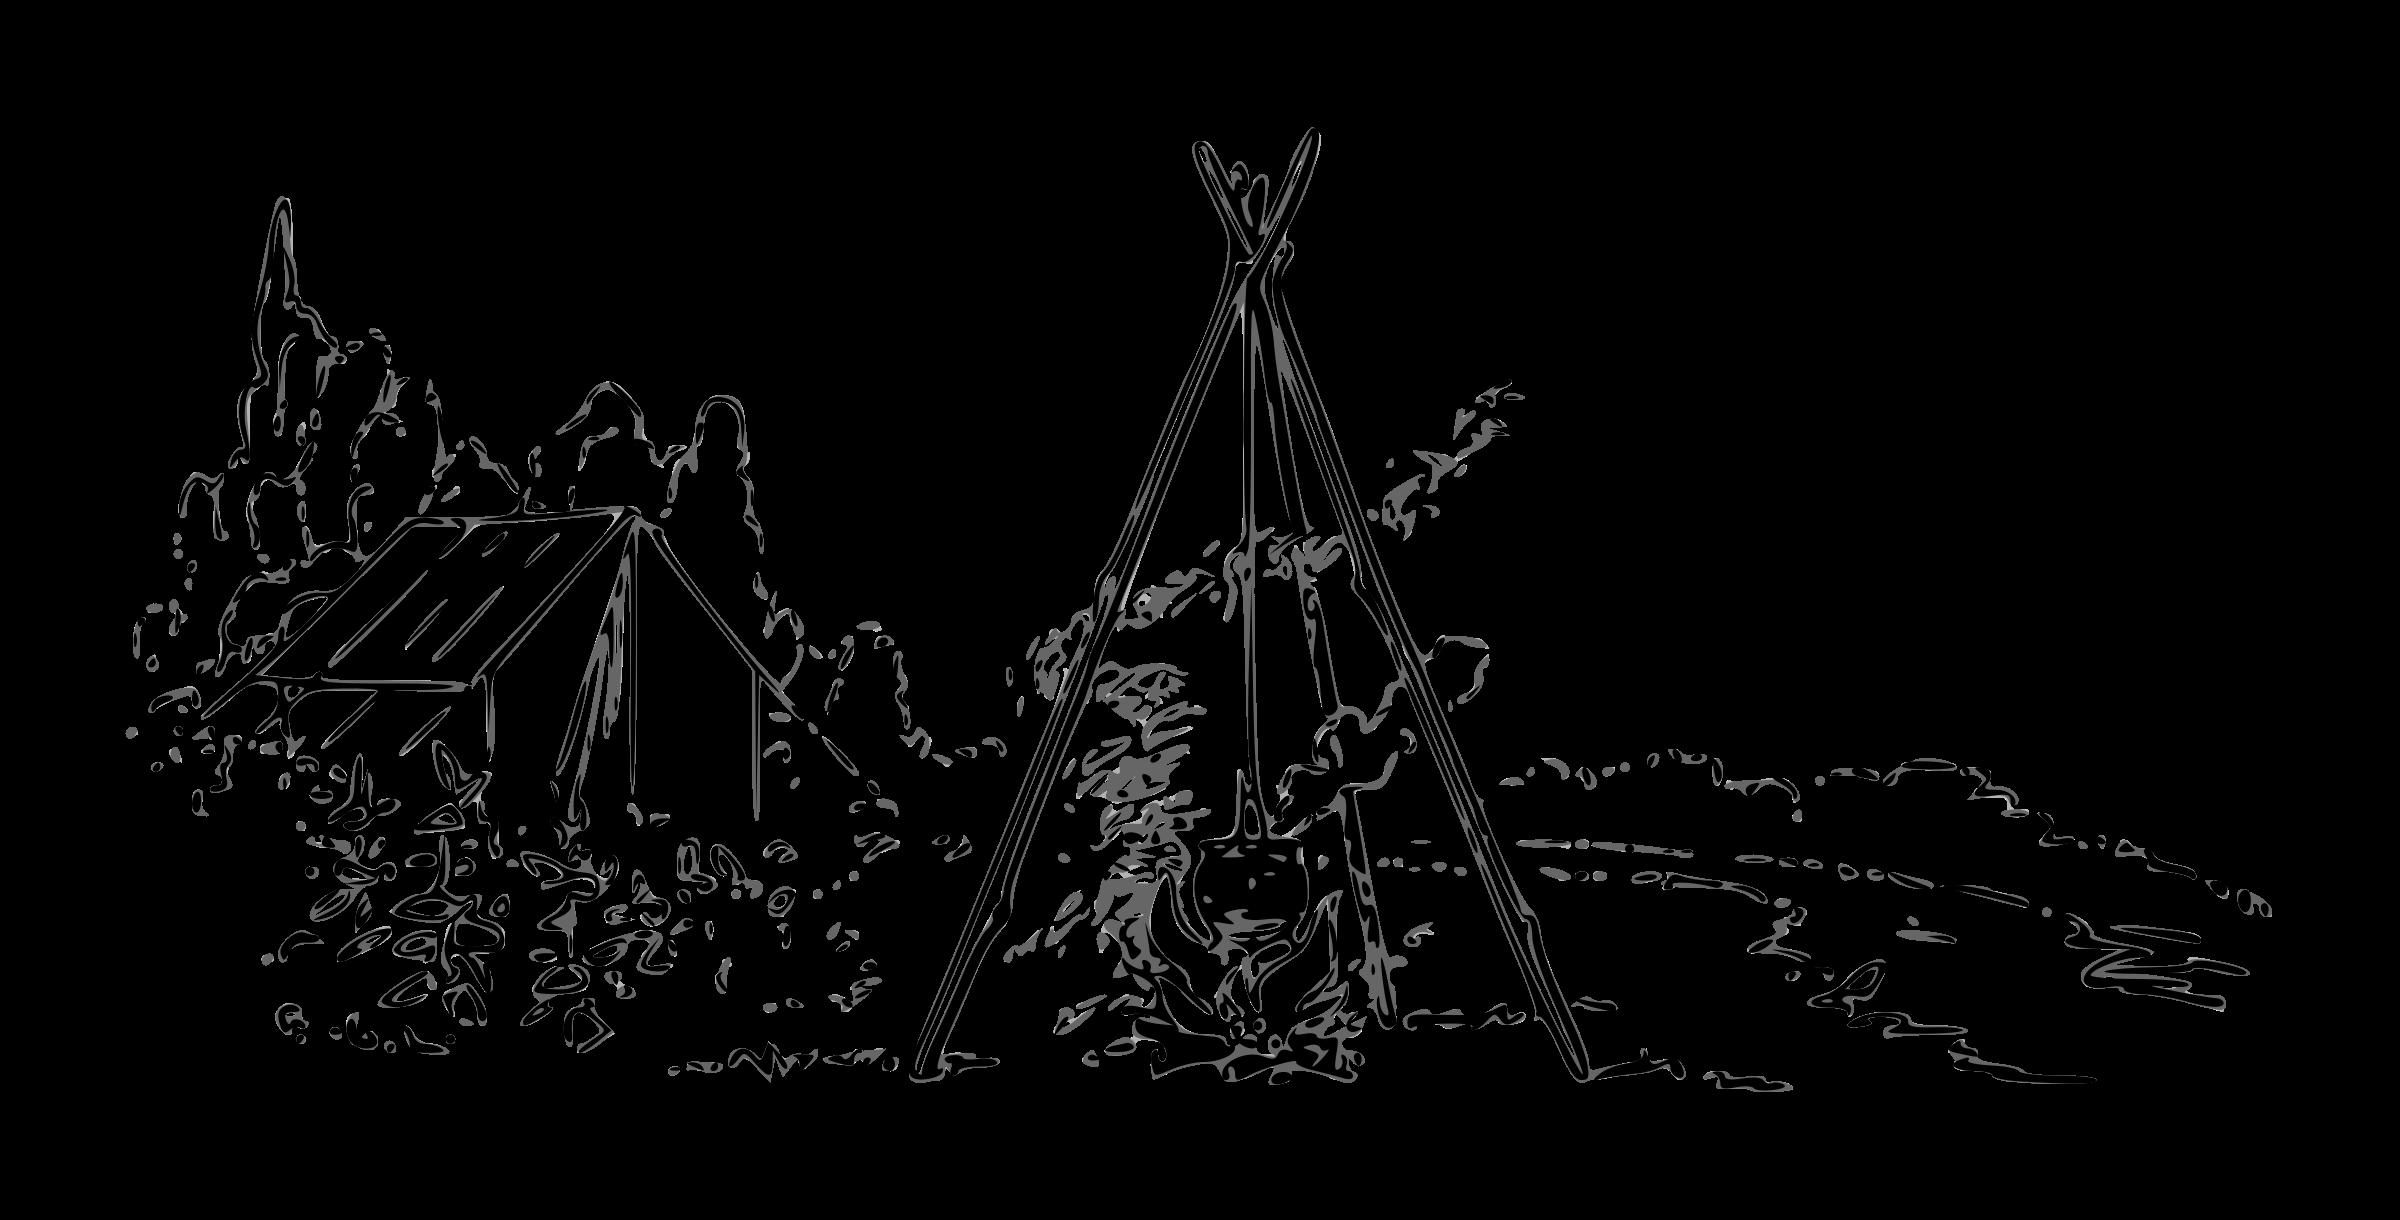 Lutz outline big image. Clipart tent campfire